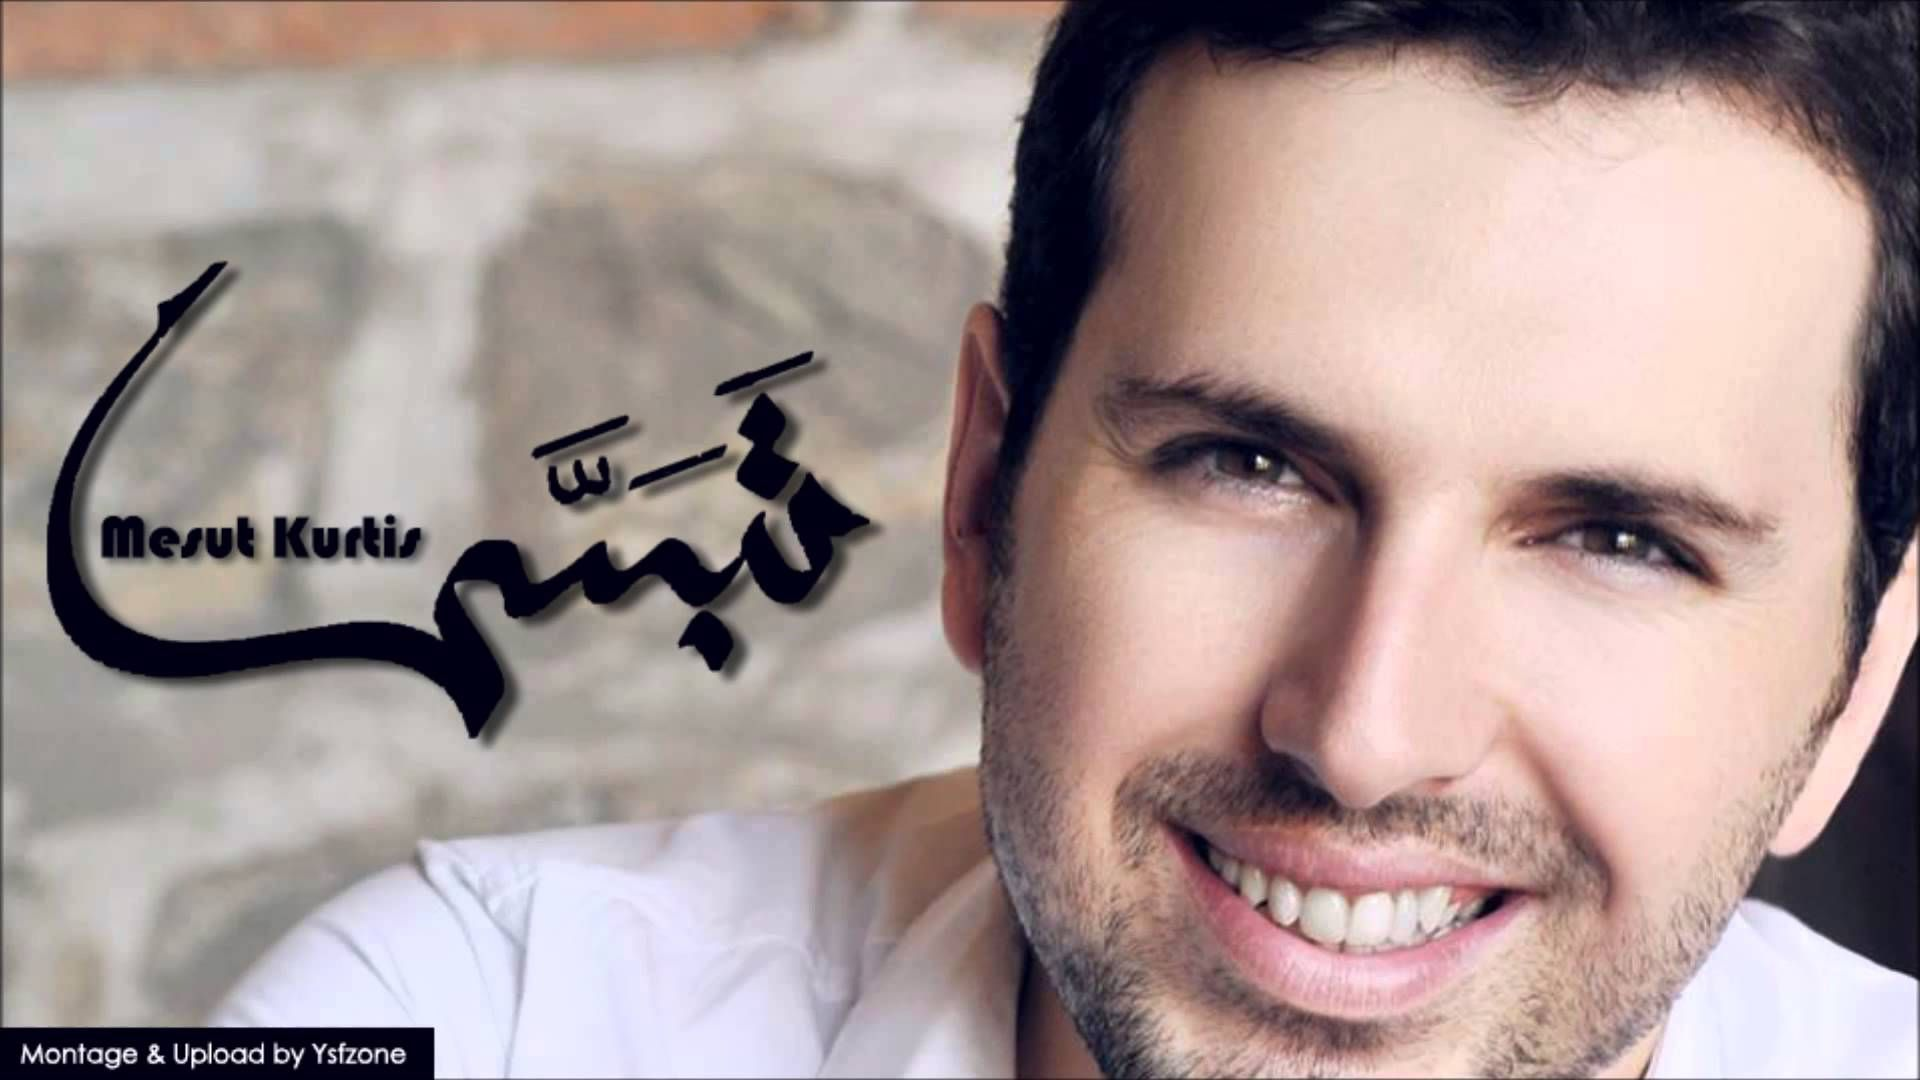 Mesut Kurtis Tabassam Smile تبسم 2014 High Quality 320kps Kurti Mens Sunglasses Style